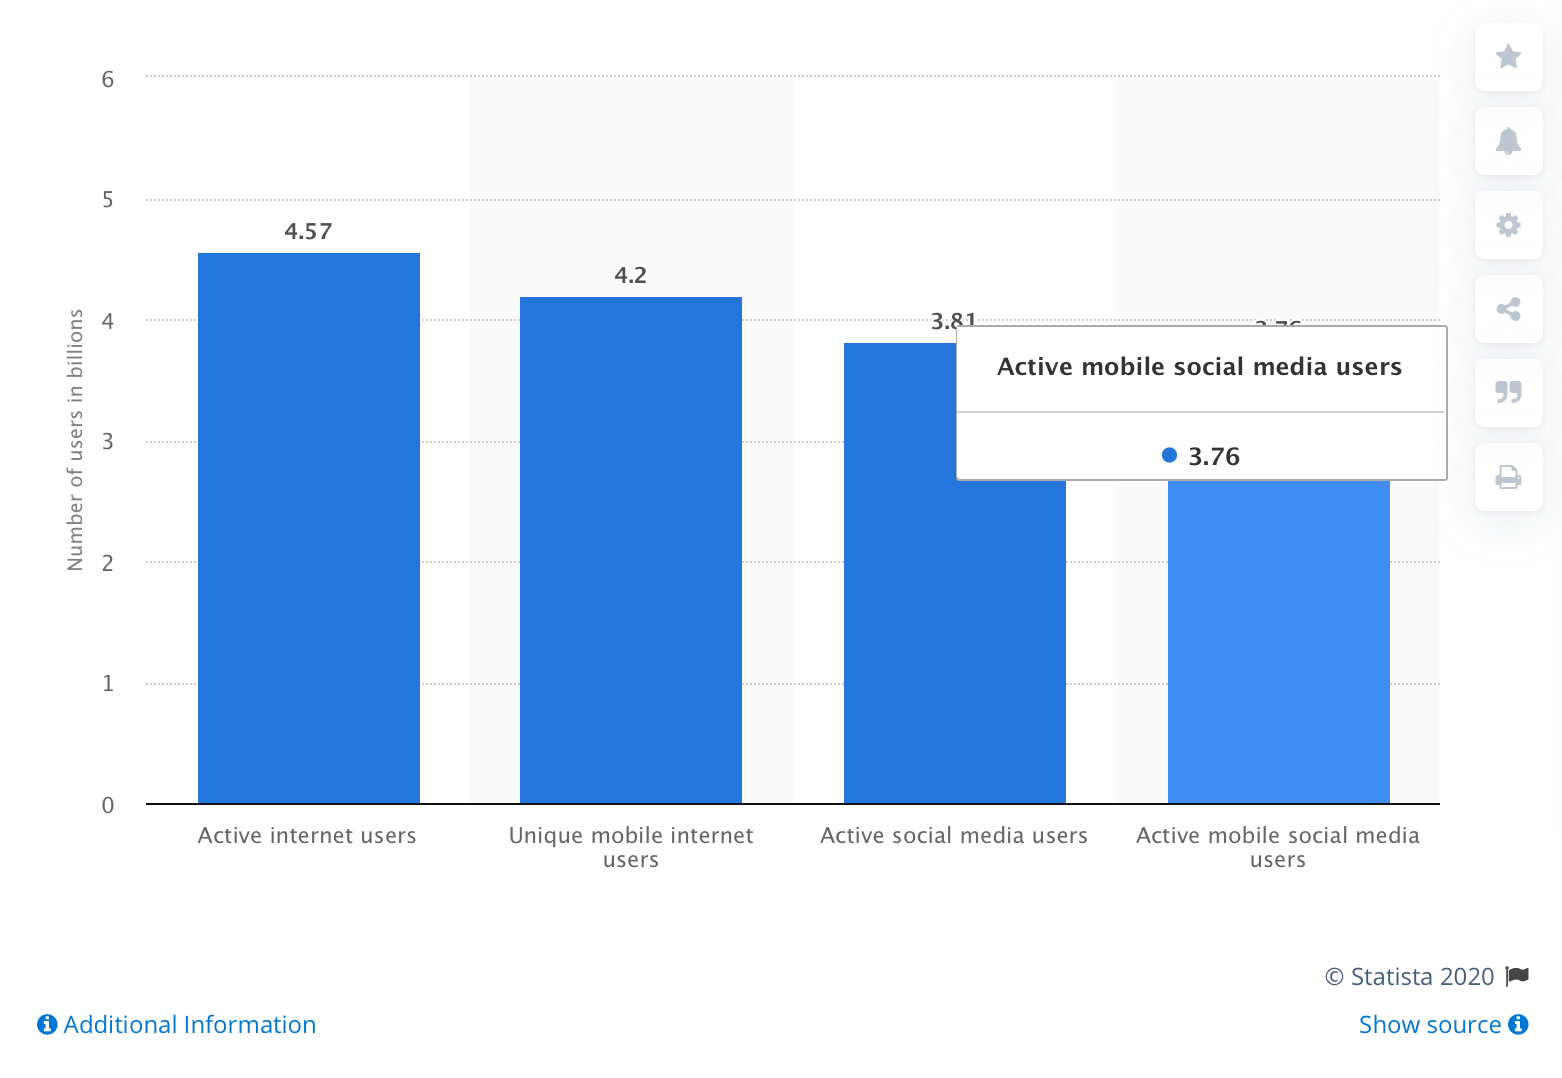 Global digital population as of April 2020